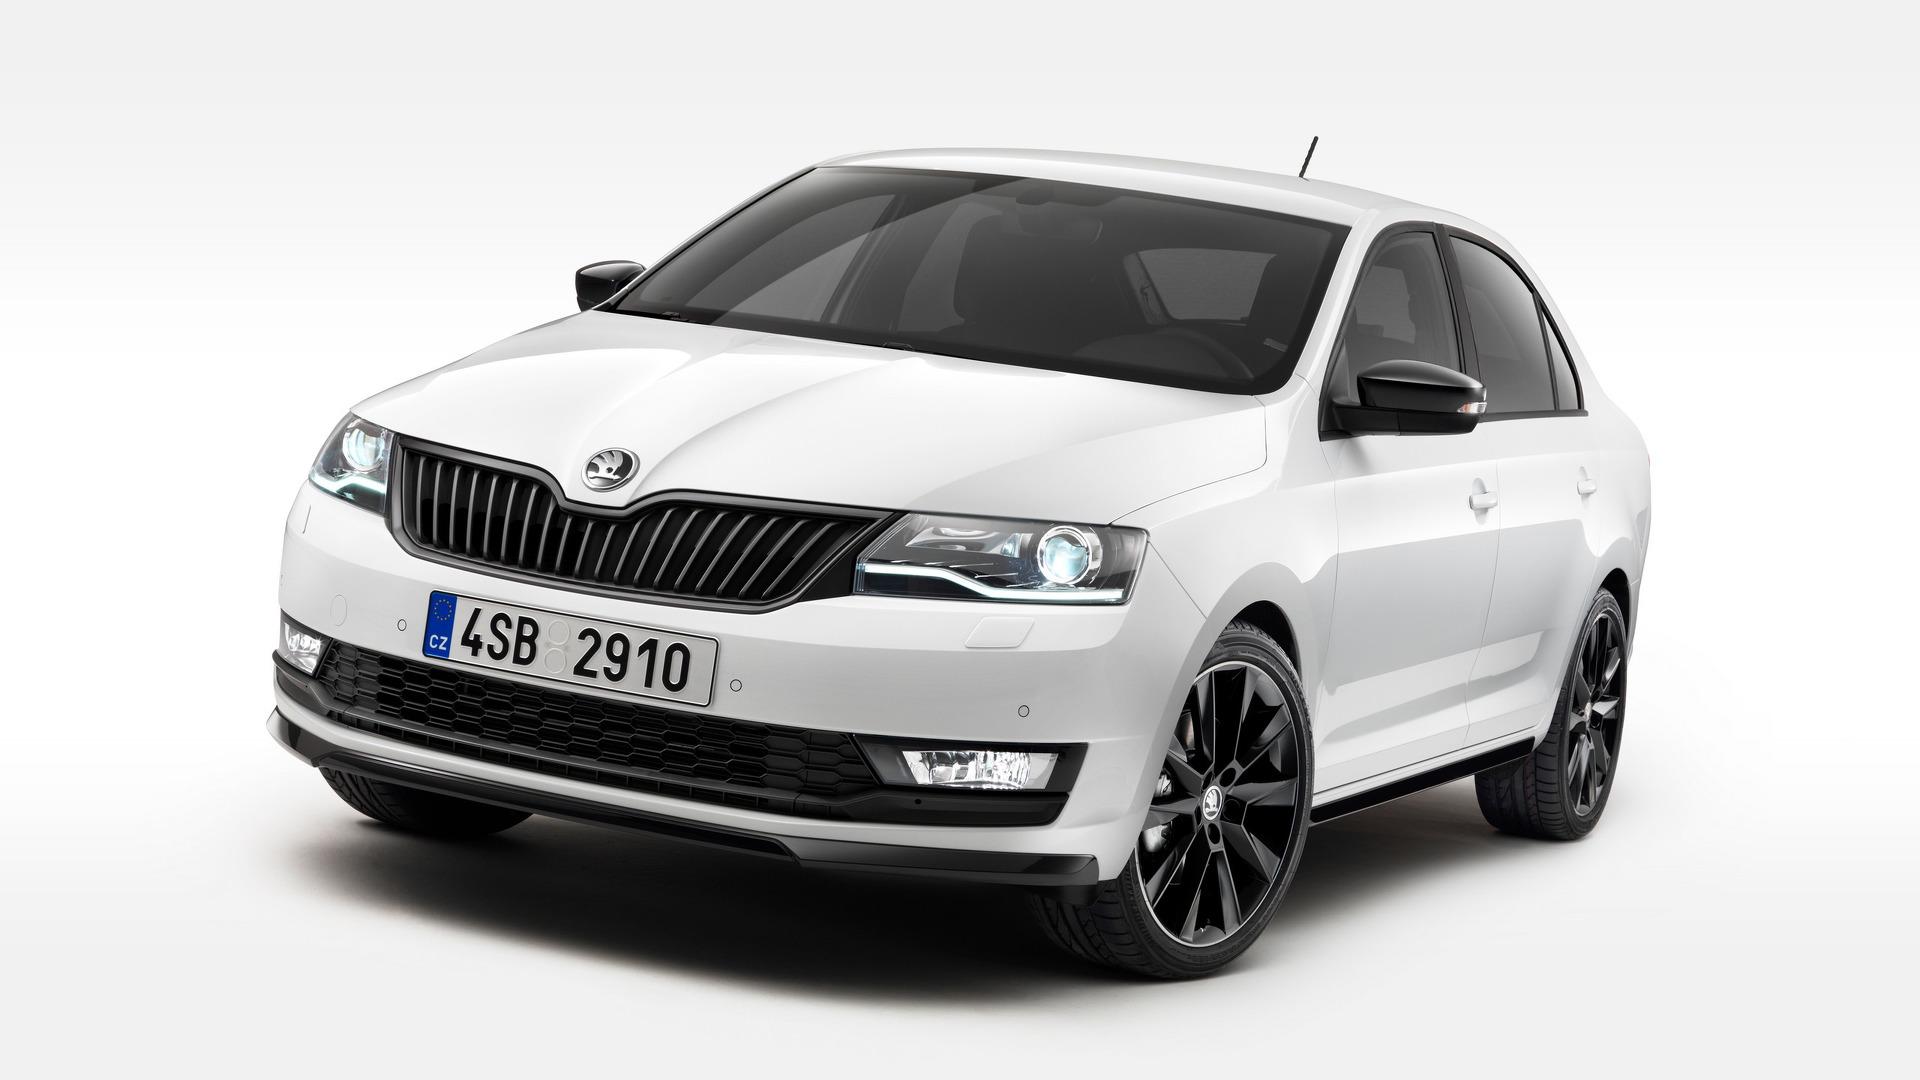 Skoda Rapid Facelift Revealed With Bi Xenon Headlights 1 0 Tsi